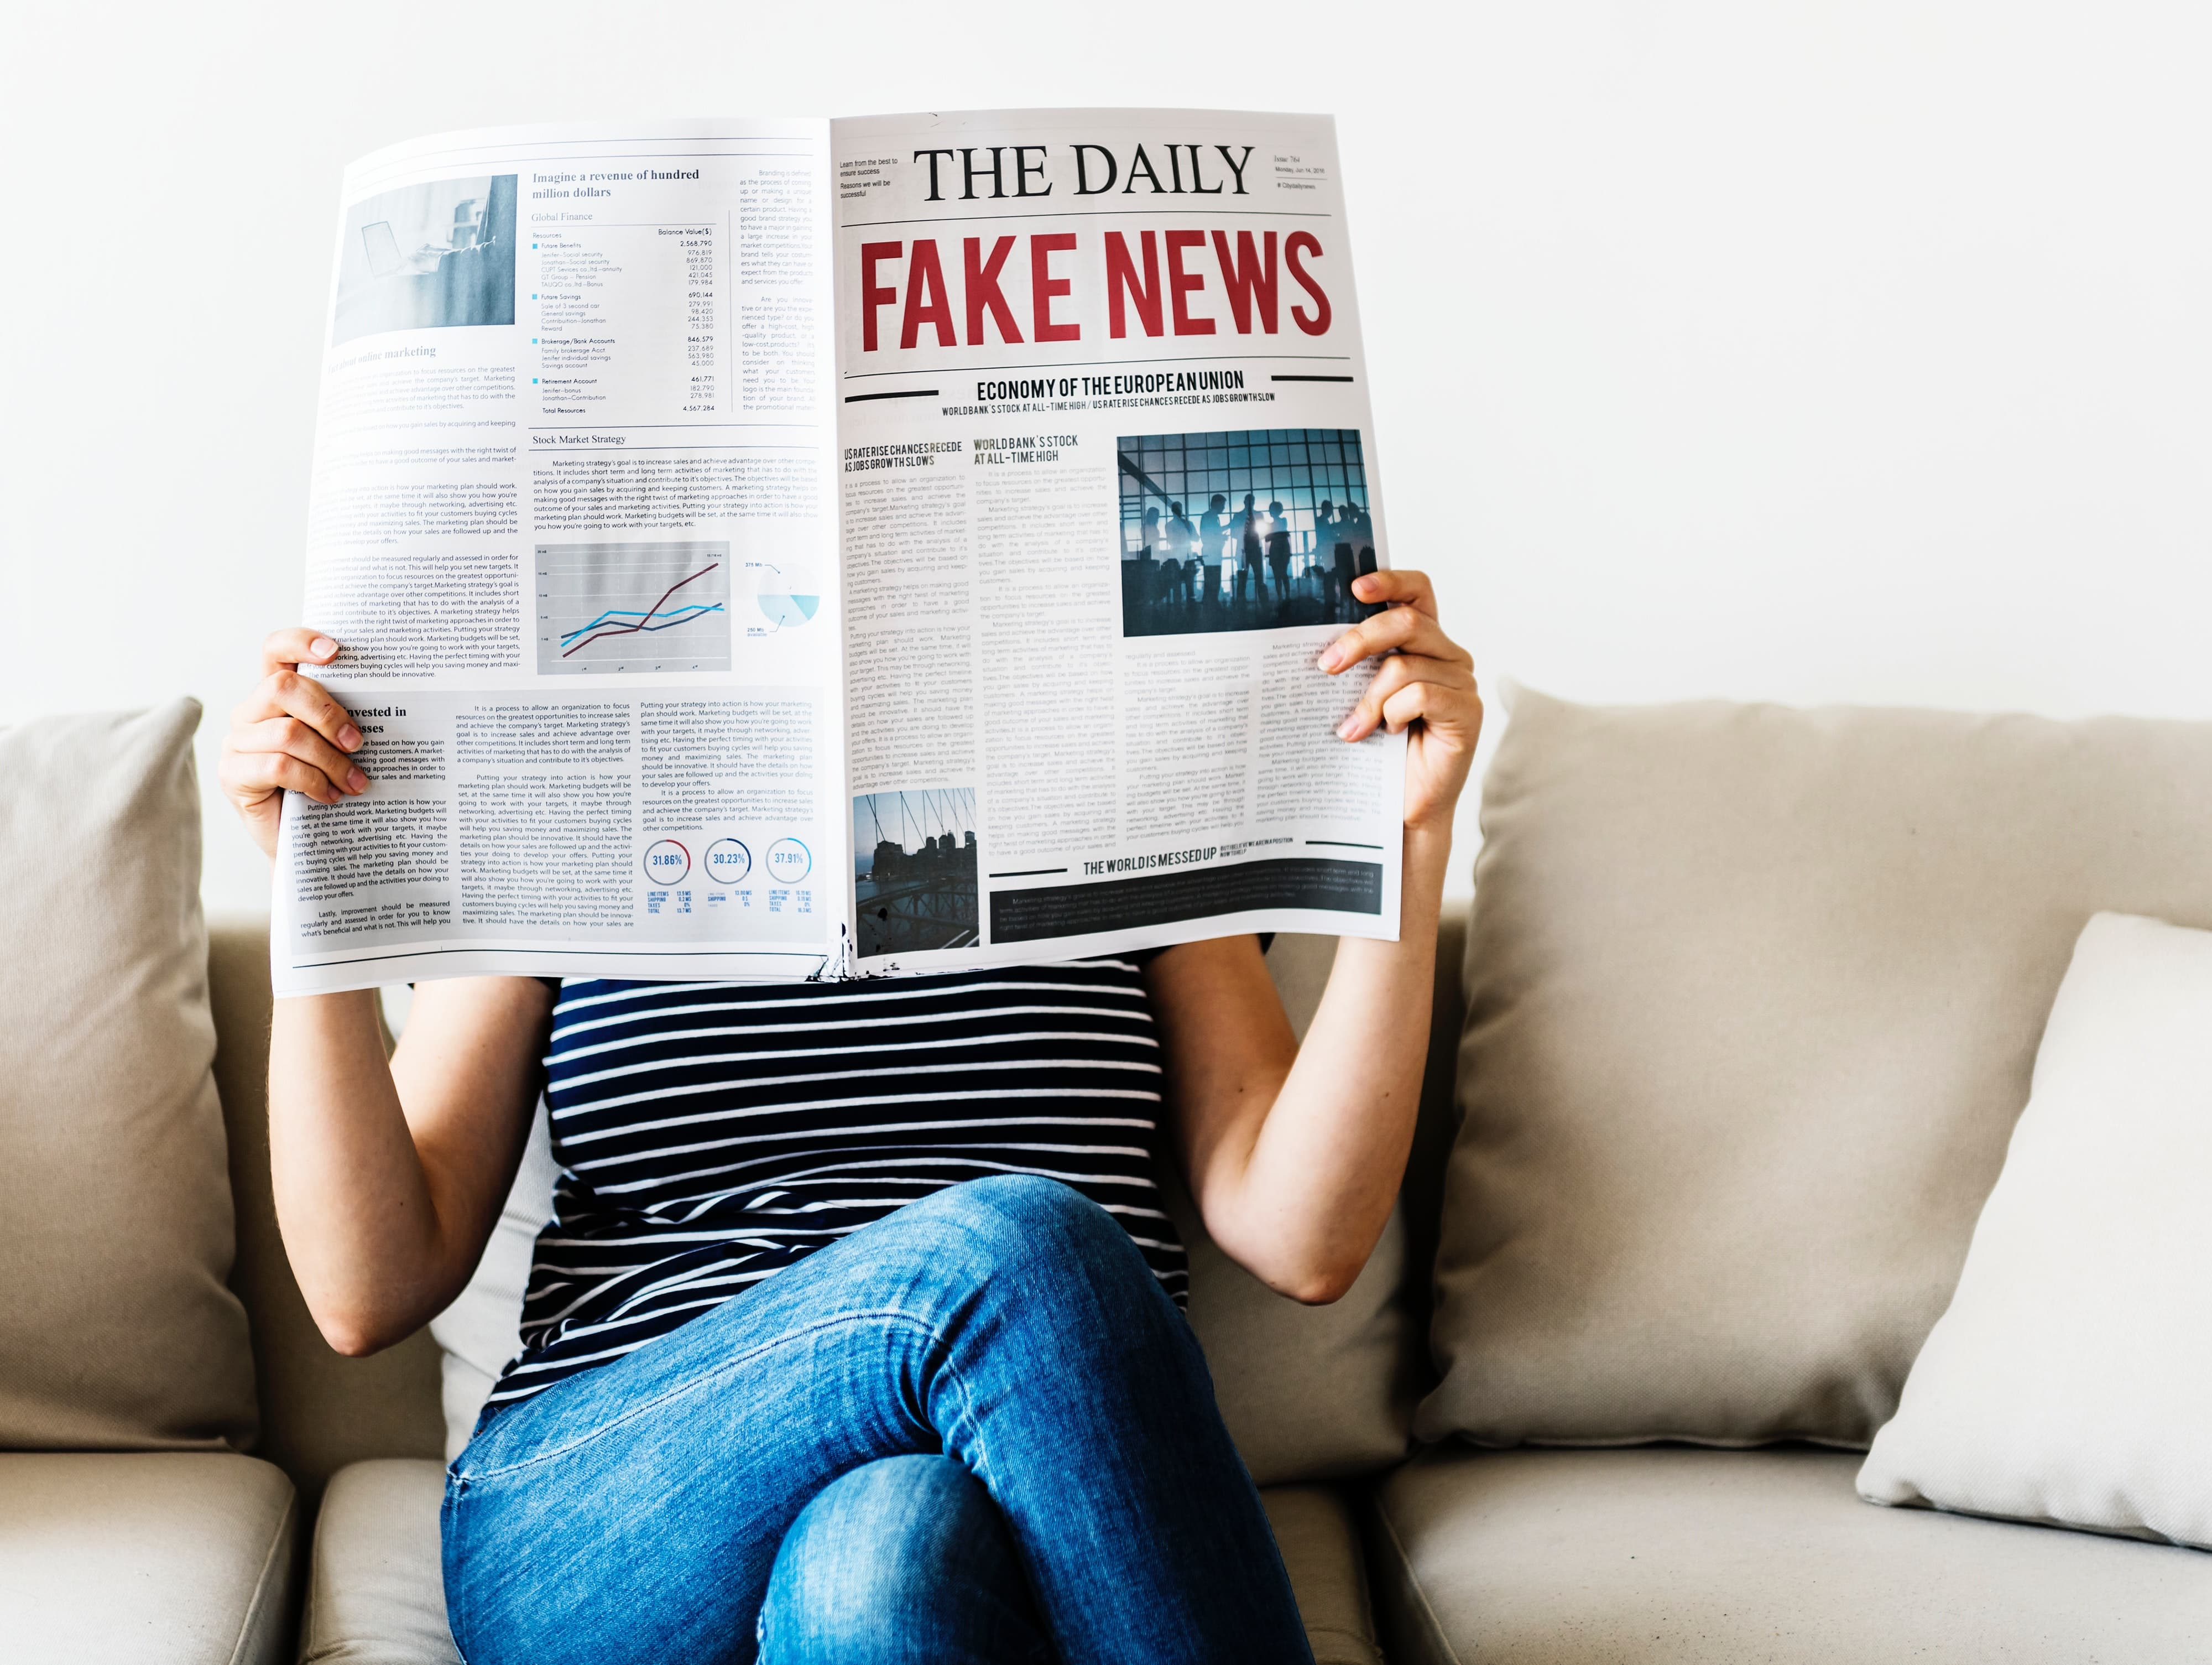 newspaper showing fake news